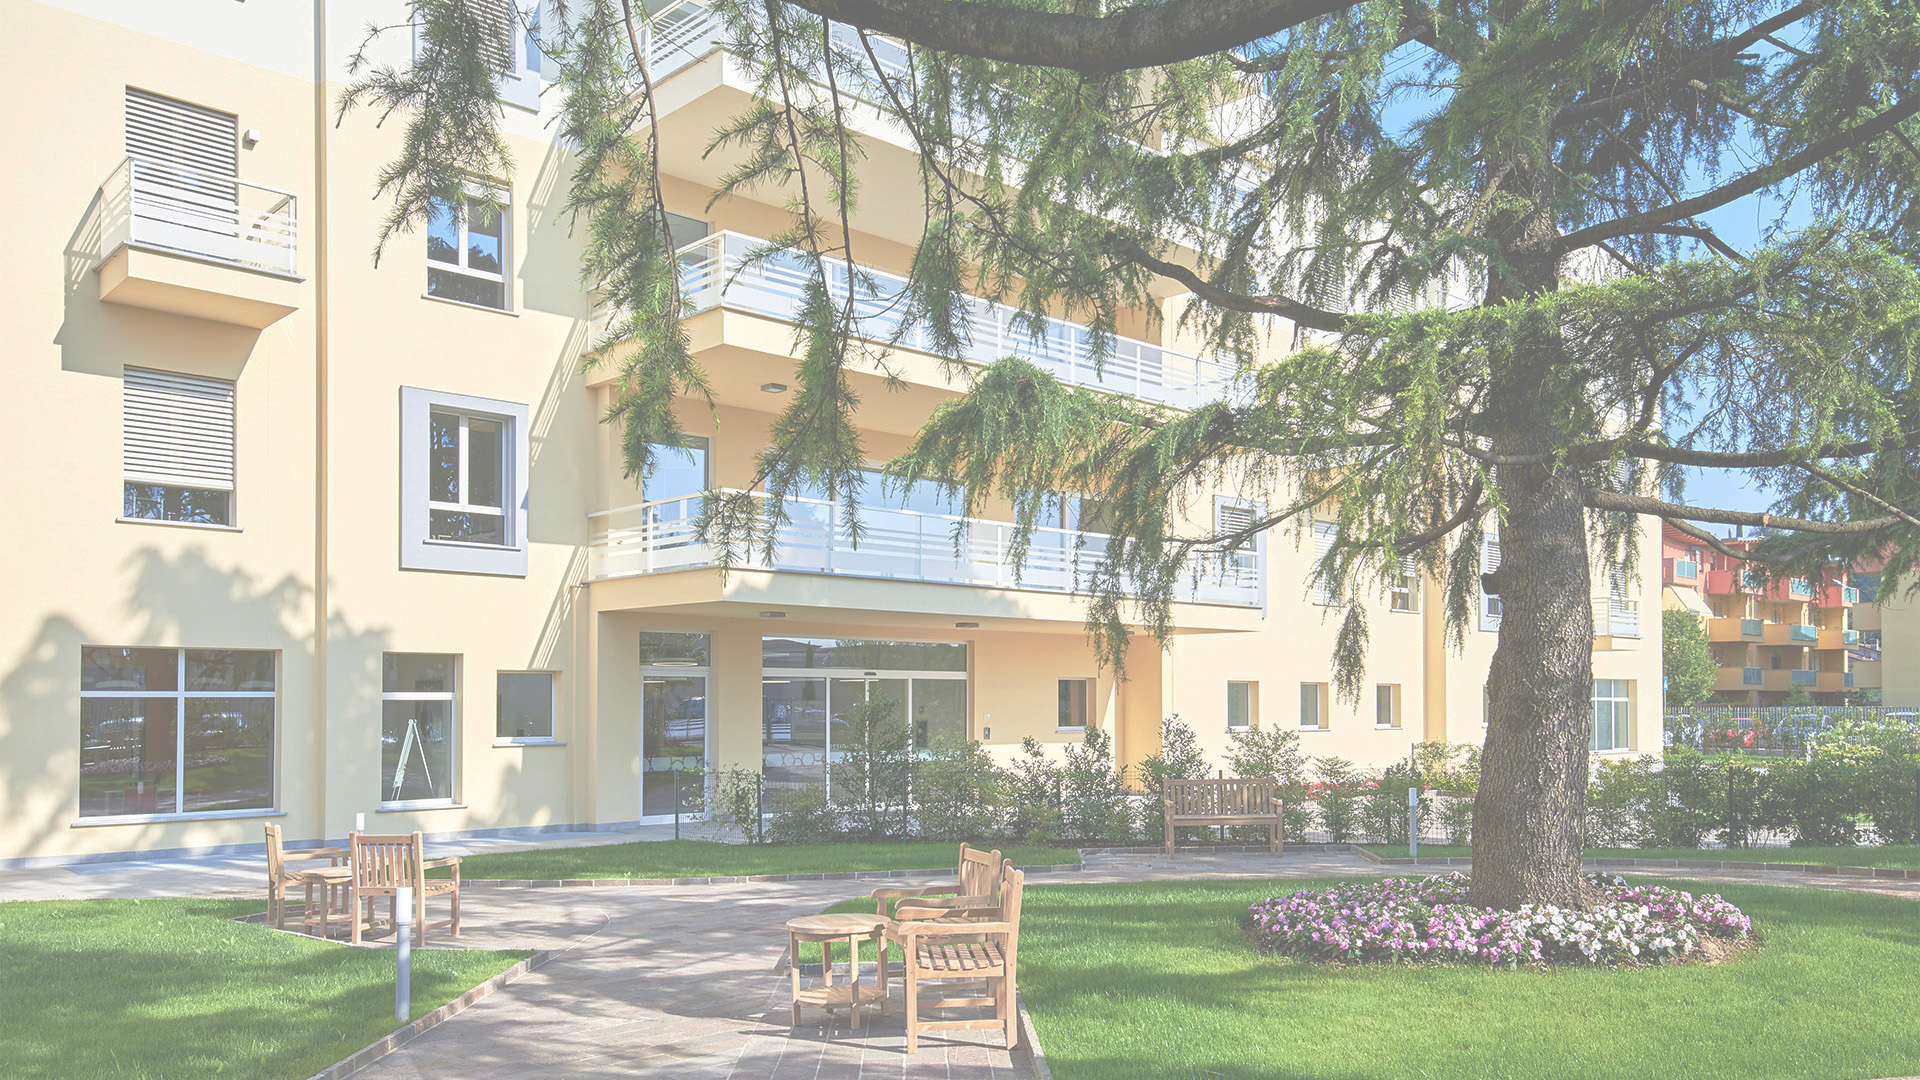 RSA Residenza Primavera - Albano Sant'Alessandro (Bergamo)